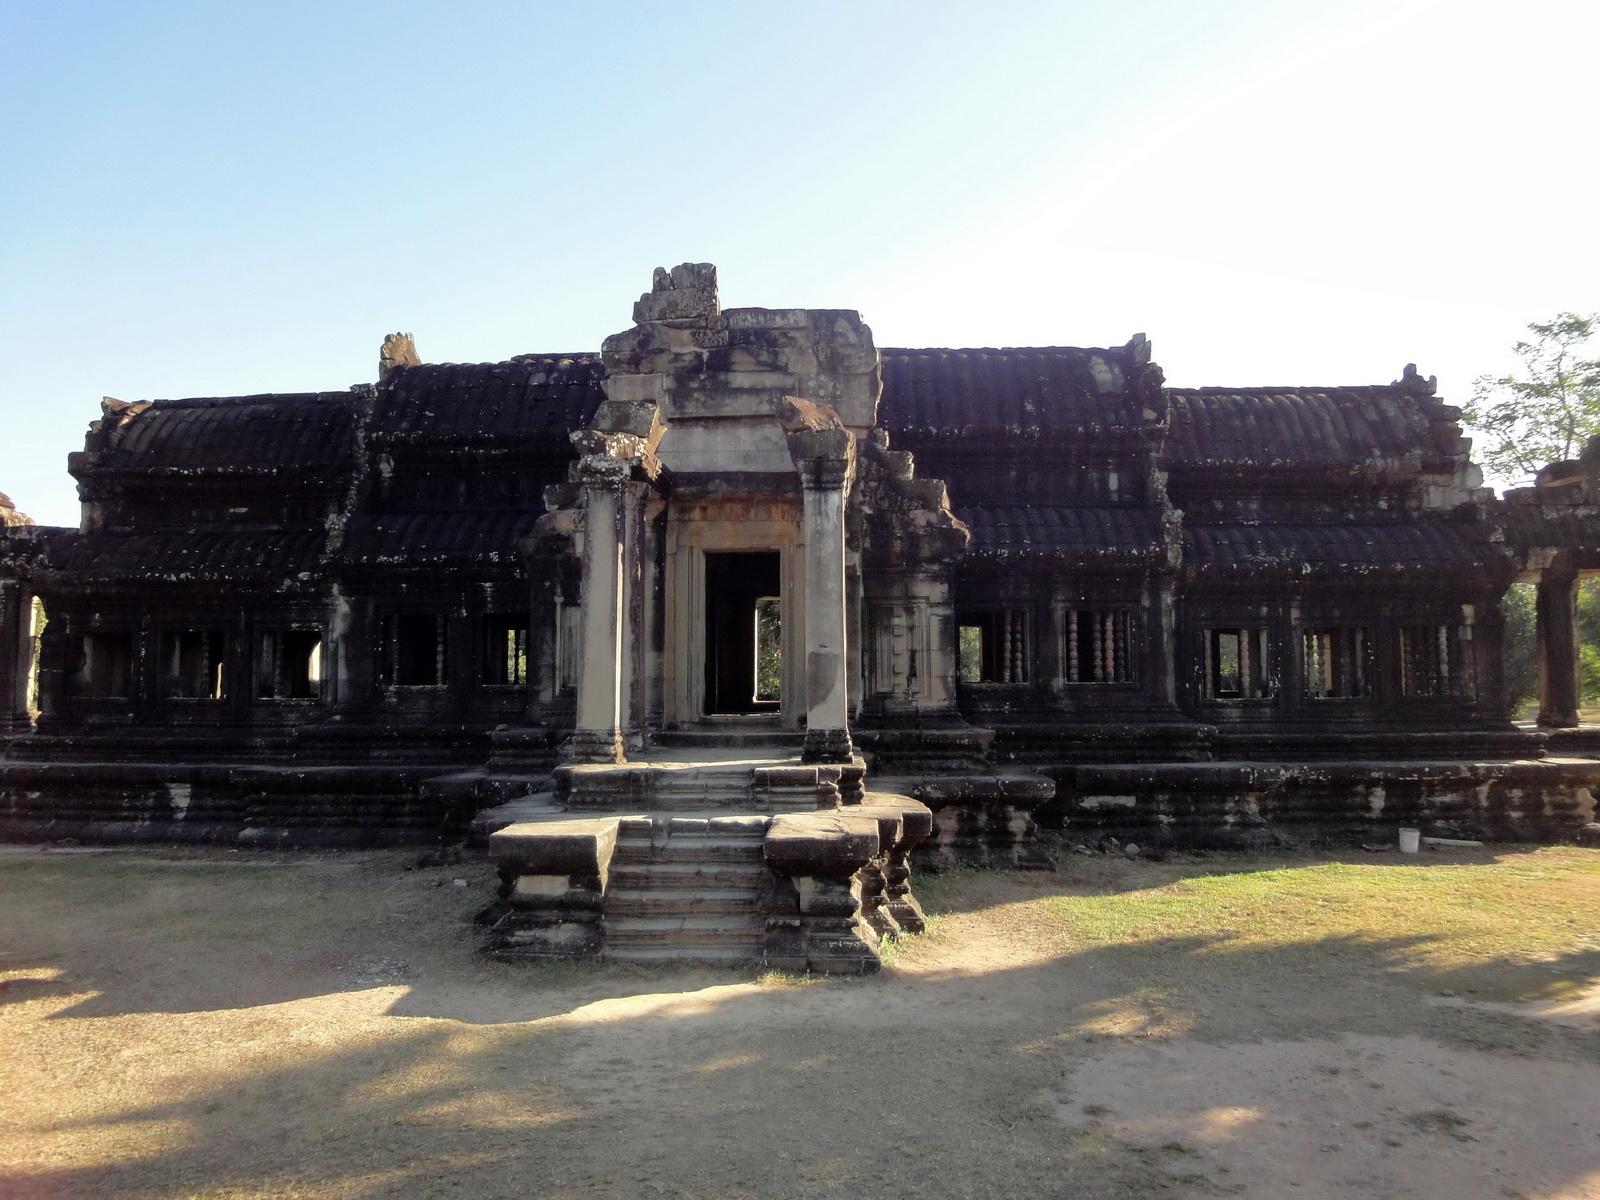 Angkor Wat Khmer architecture external library SW corner 05